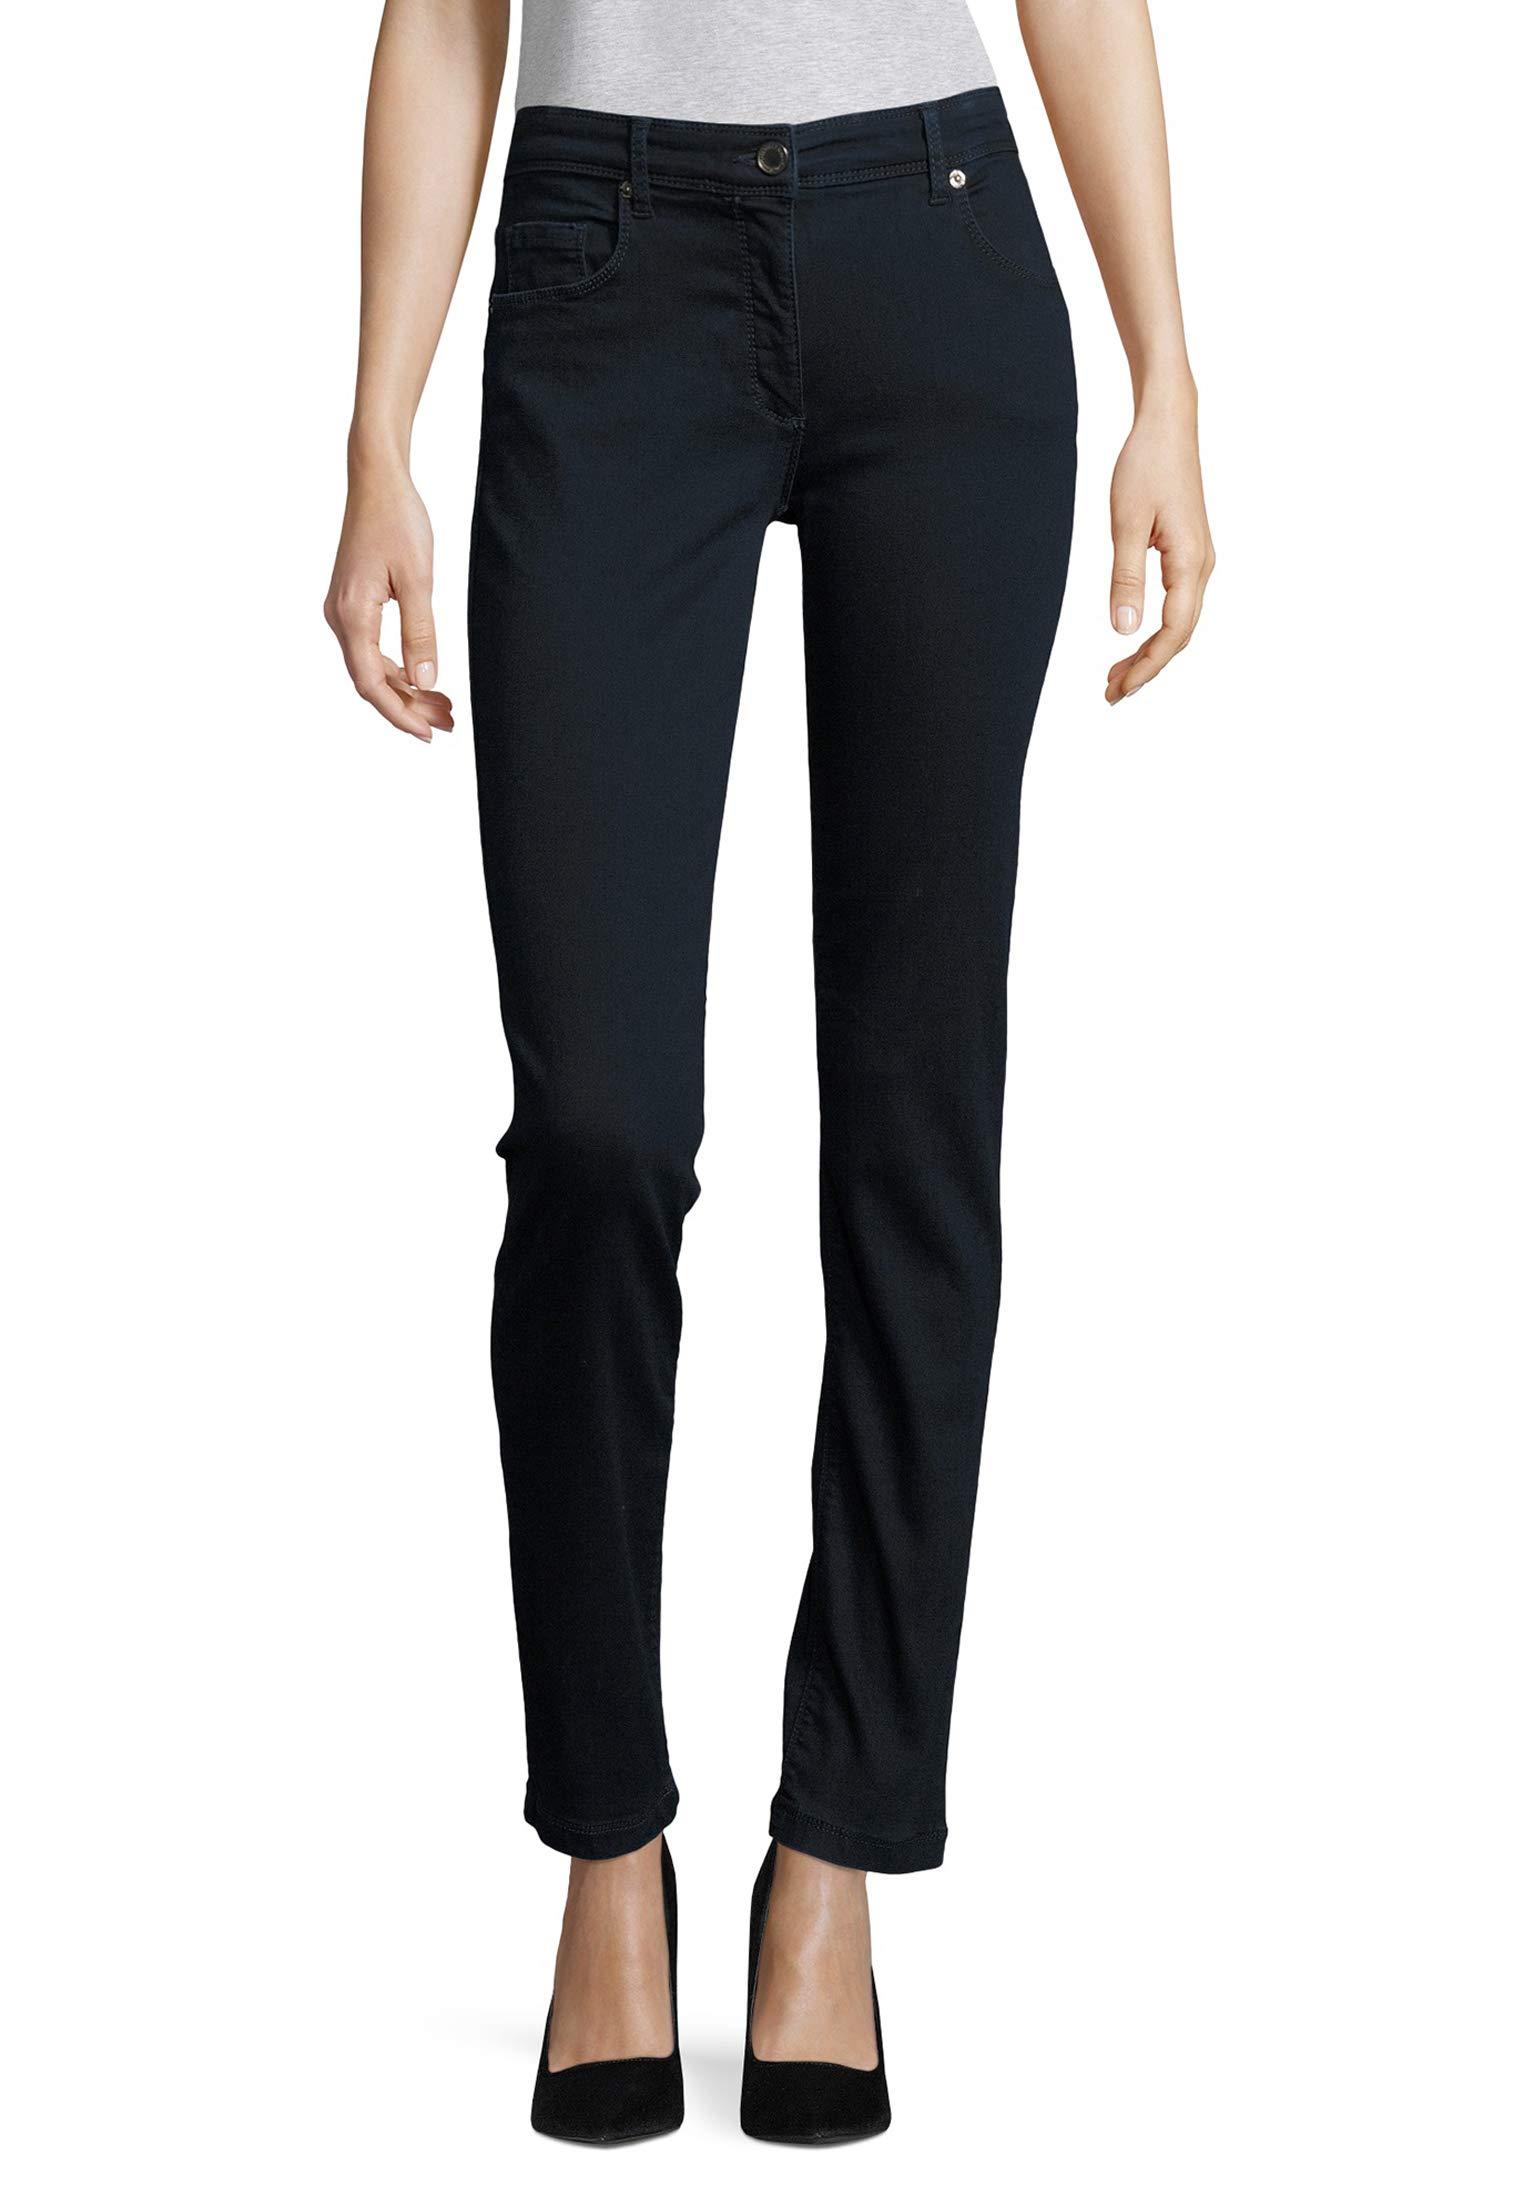 Barclay Blue Betty FemmeBleudeep PerfectJeans Denim 862448 Slim KTlFc1J